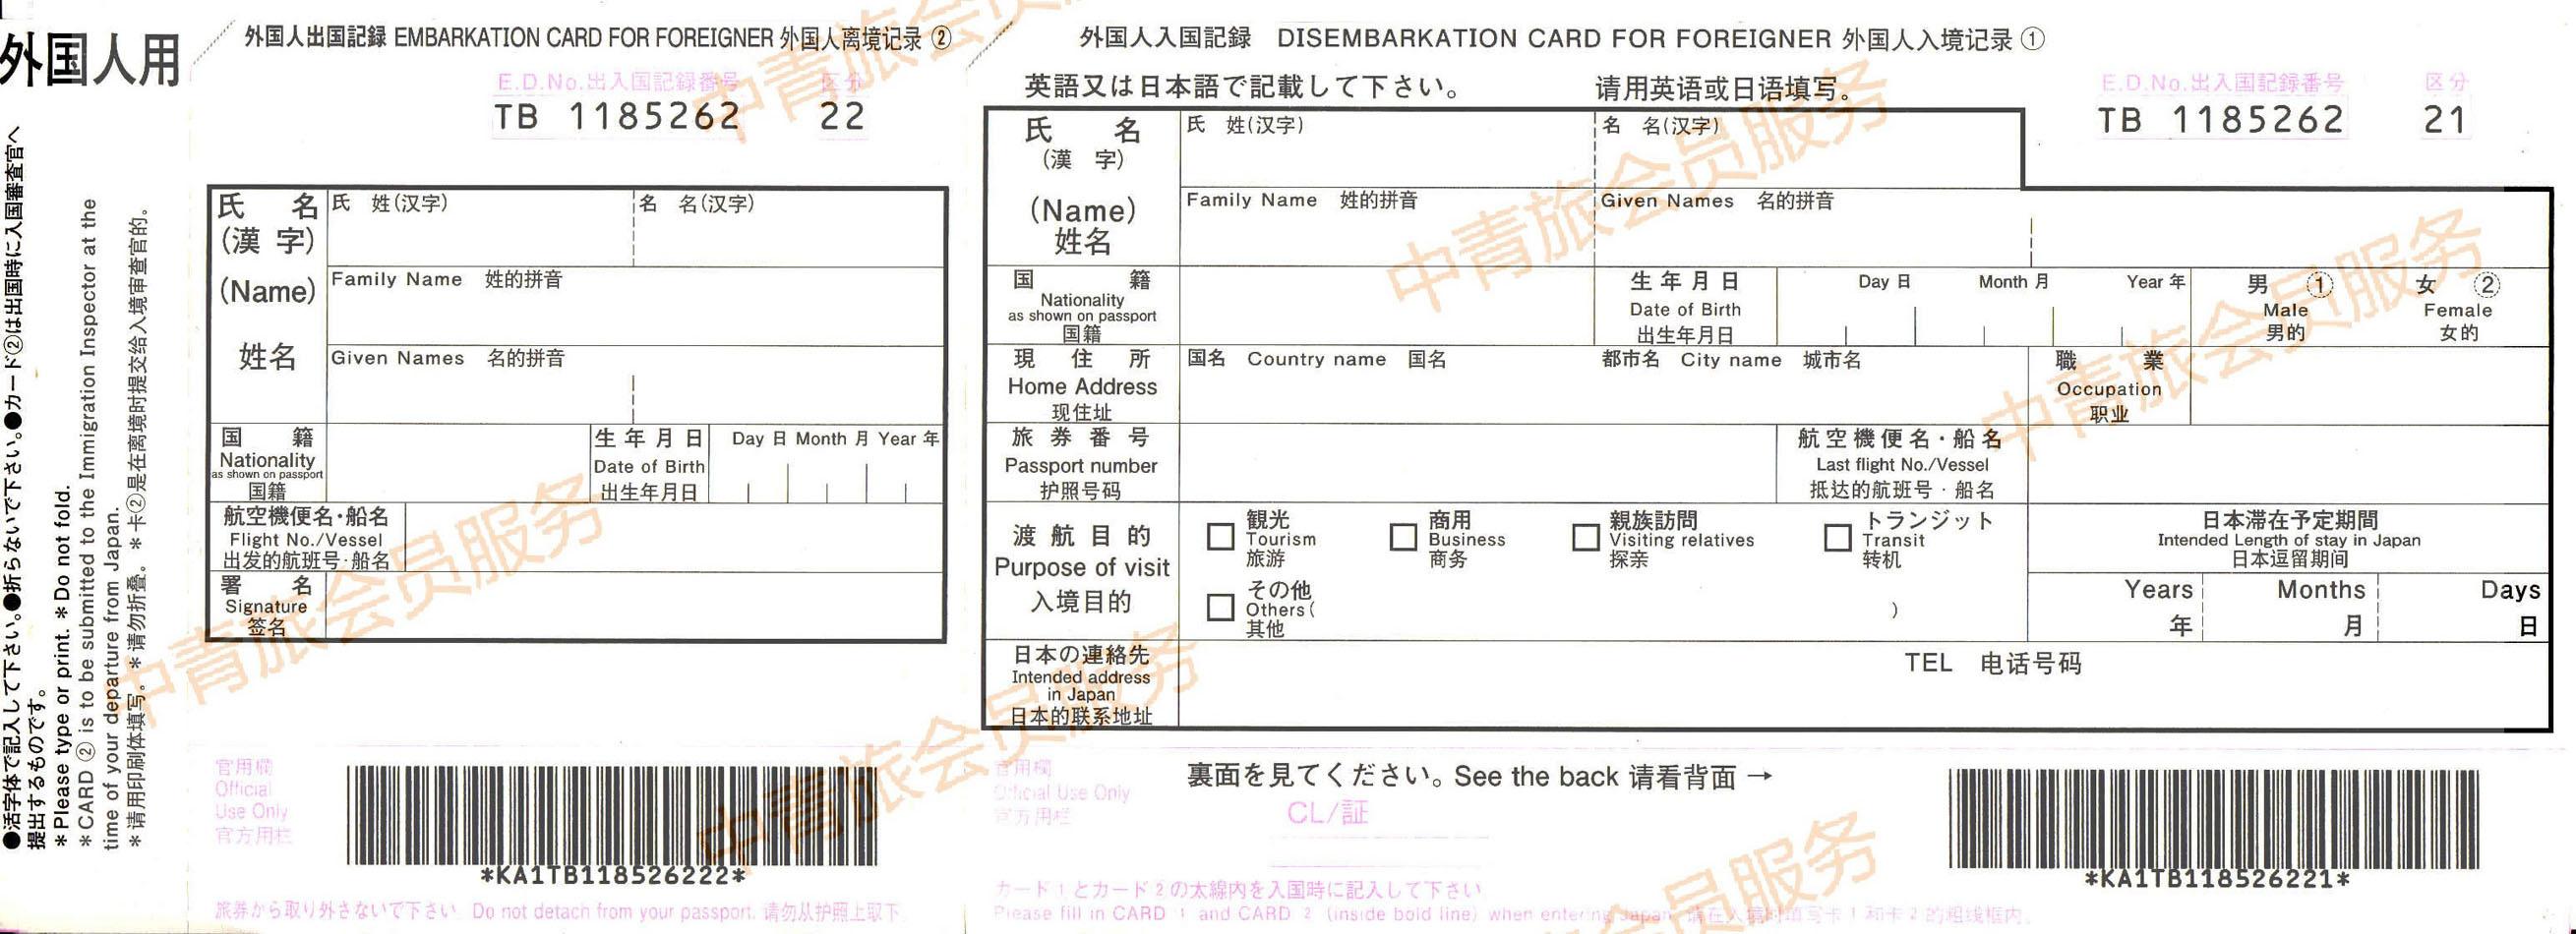 日本-出入境卡(正) Rb